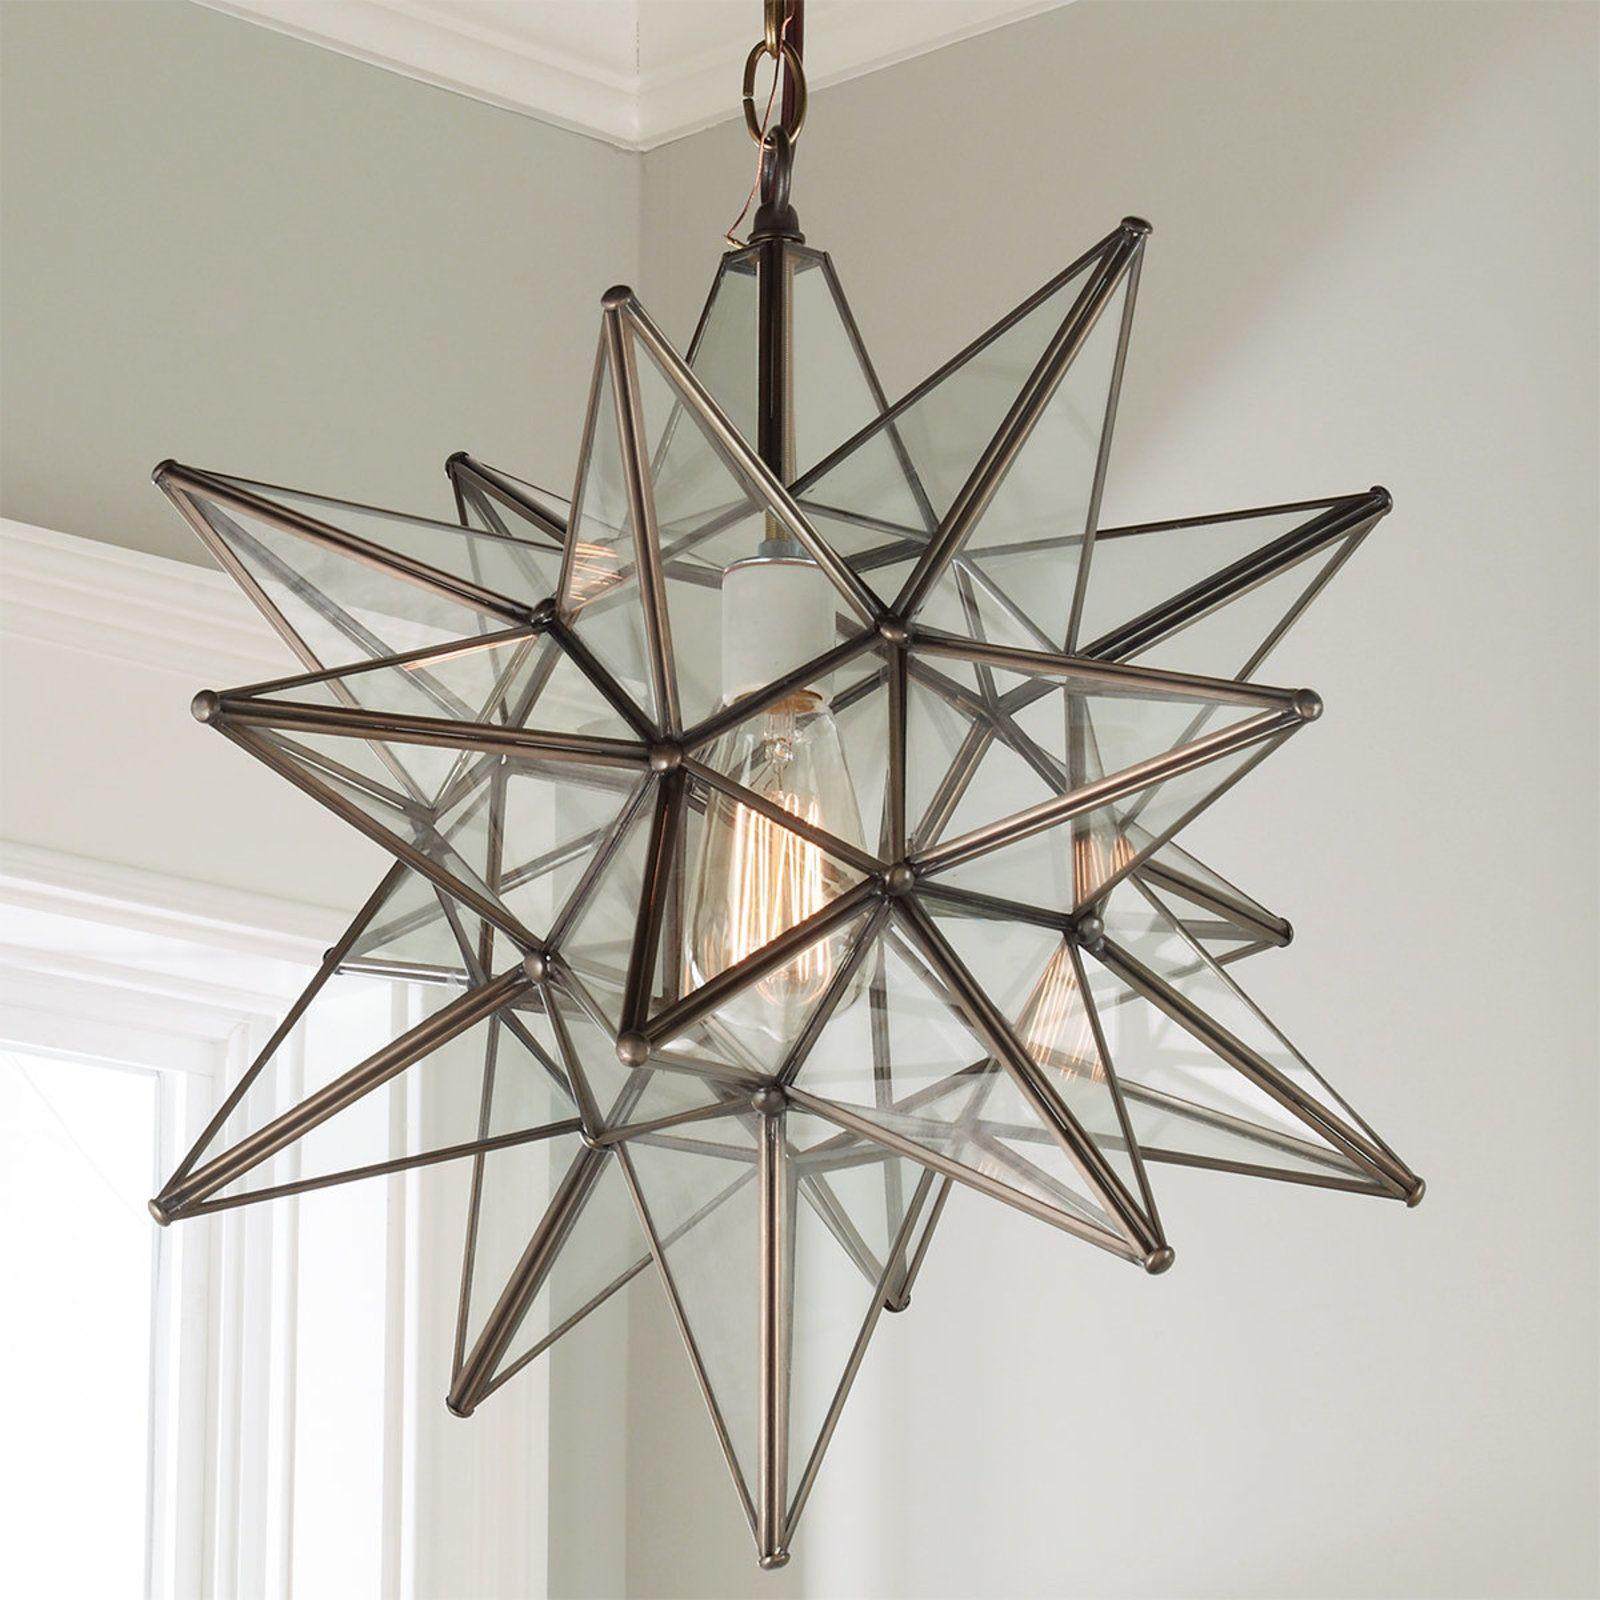 moravian light lamp world glass lighting star wonderfull of pendant crystal unique luxury modern